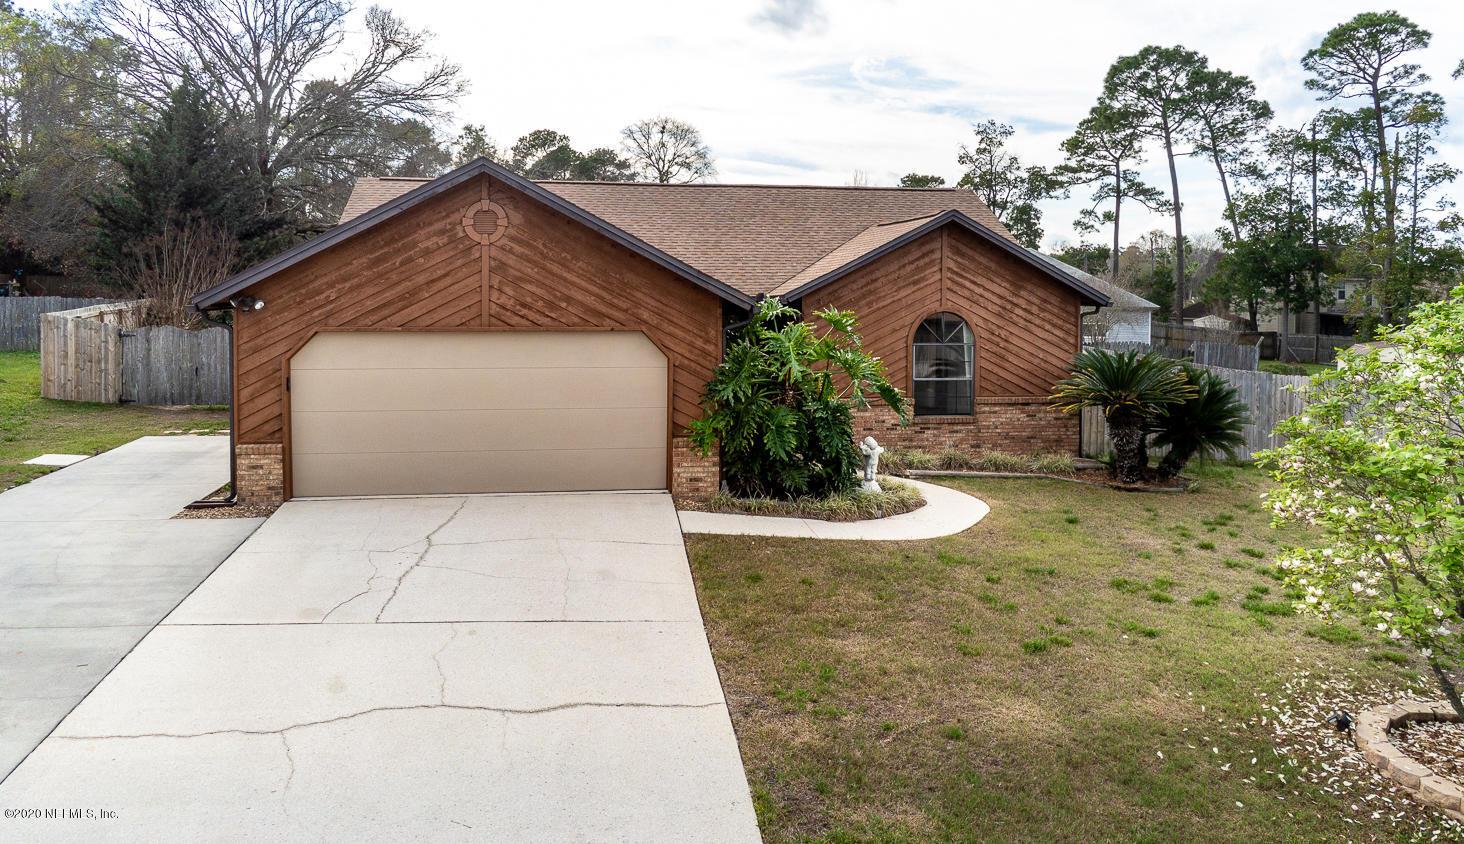 626 ROBERT LIVINGSTON, ORANGE PARK, FLORIDA 32073, 3 Bedrooms Bedrooms, ,2 BathroomsBathrooms,Residential,For sale,ROBERT LIVINGSTON,1039387